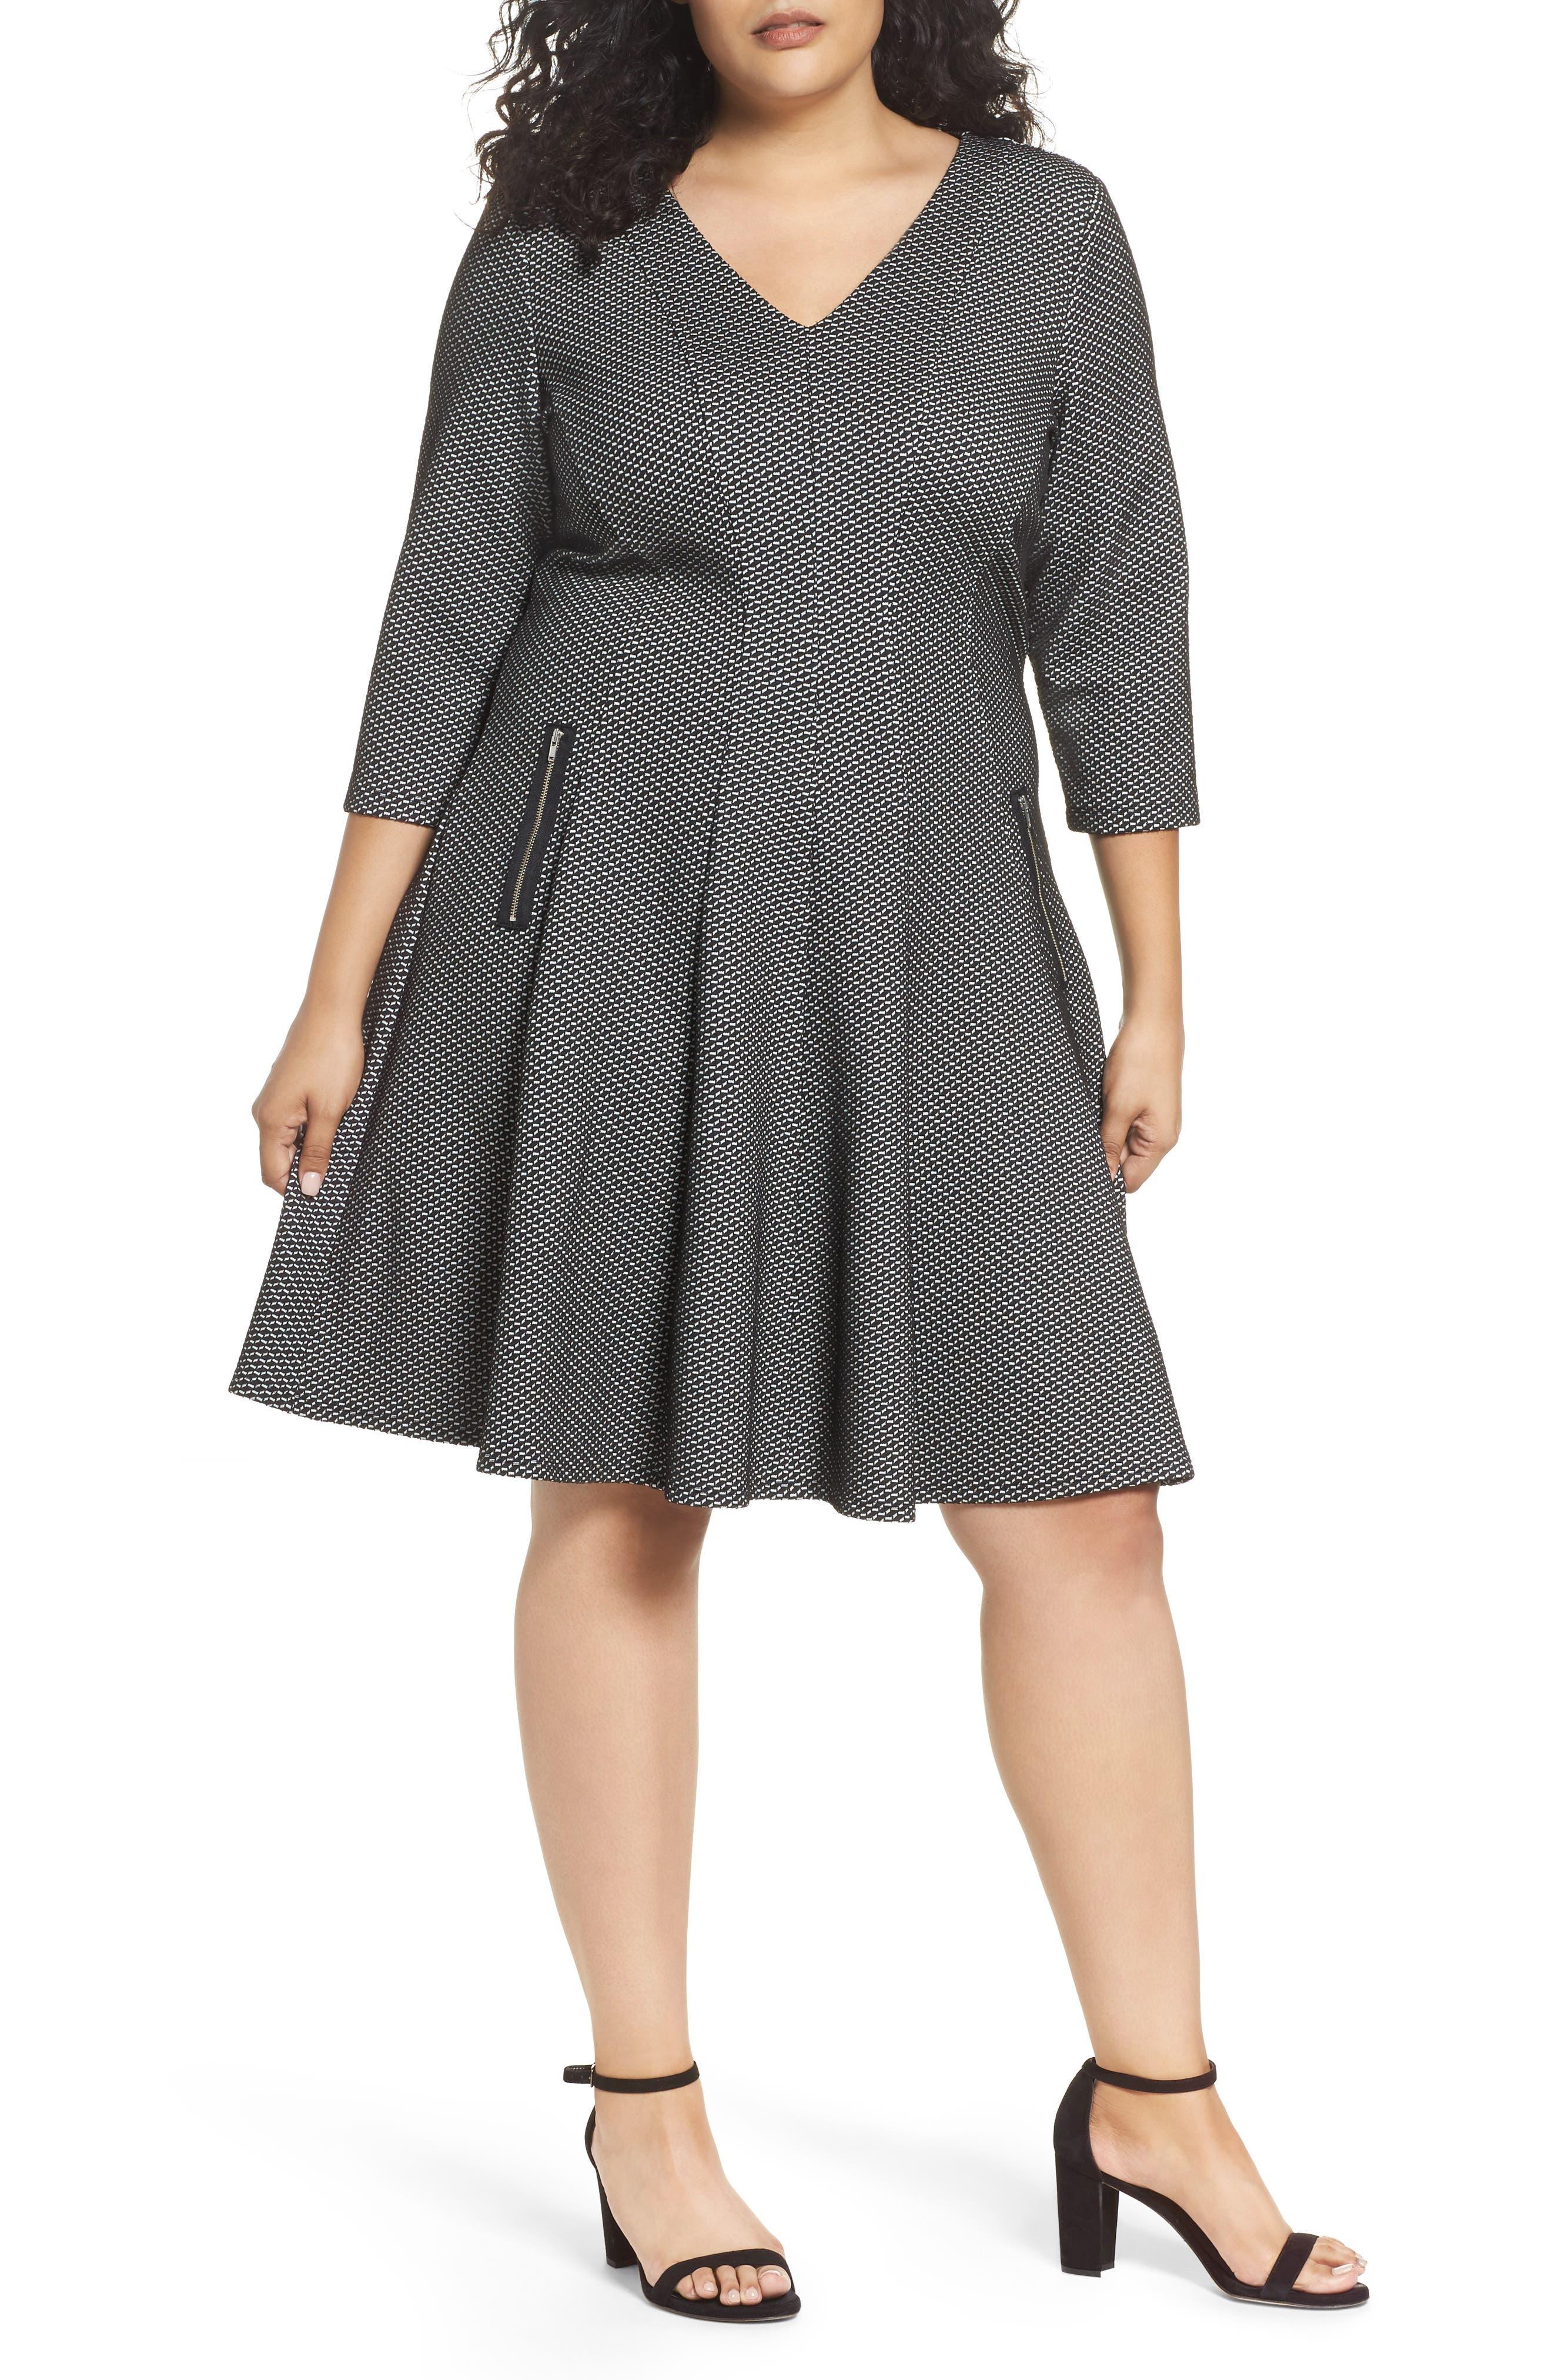 Alternate Image 1 Selected - Gabby Skye Jacquard Fit & Flare Dress (Plus Size)